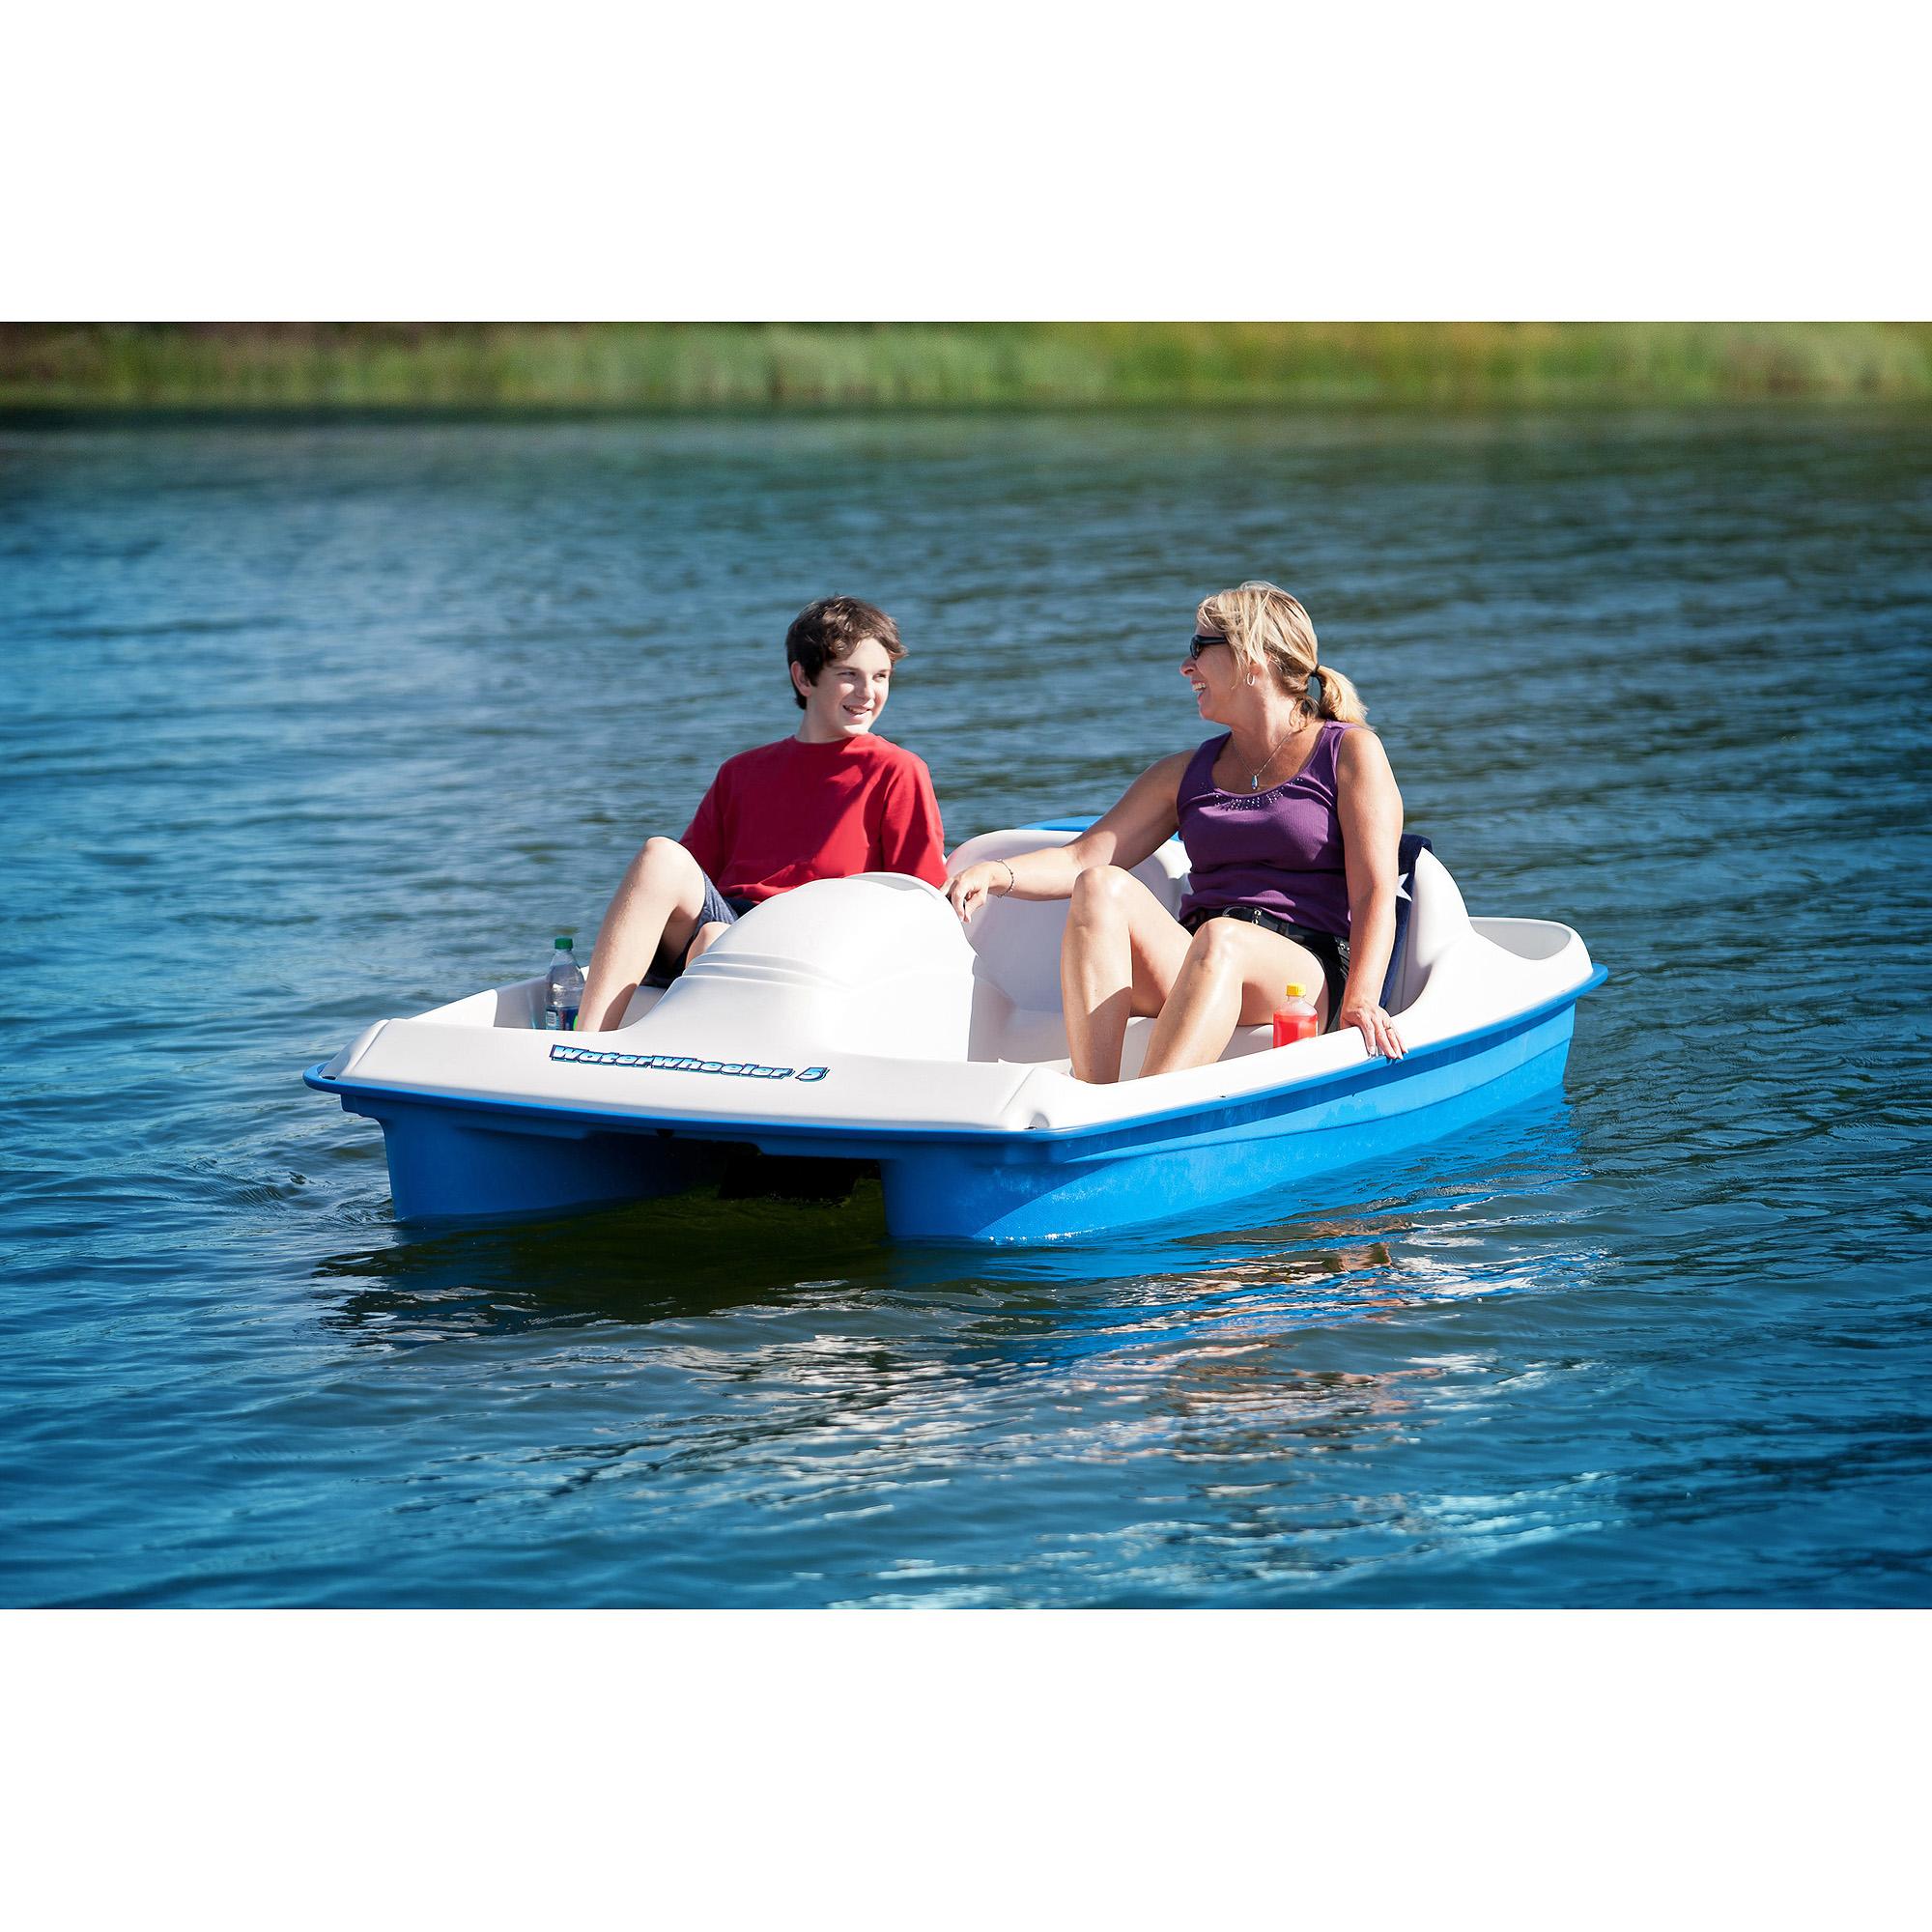 Water Wheeler Pedal Boat, Blue - Walmart.com